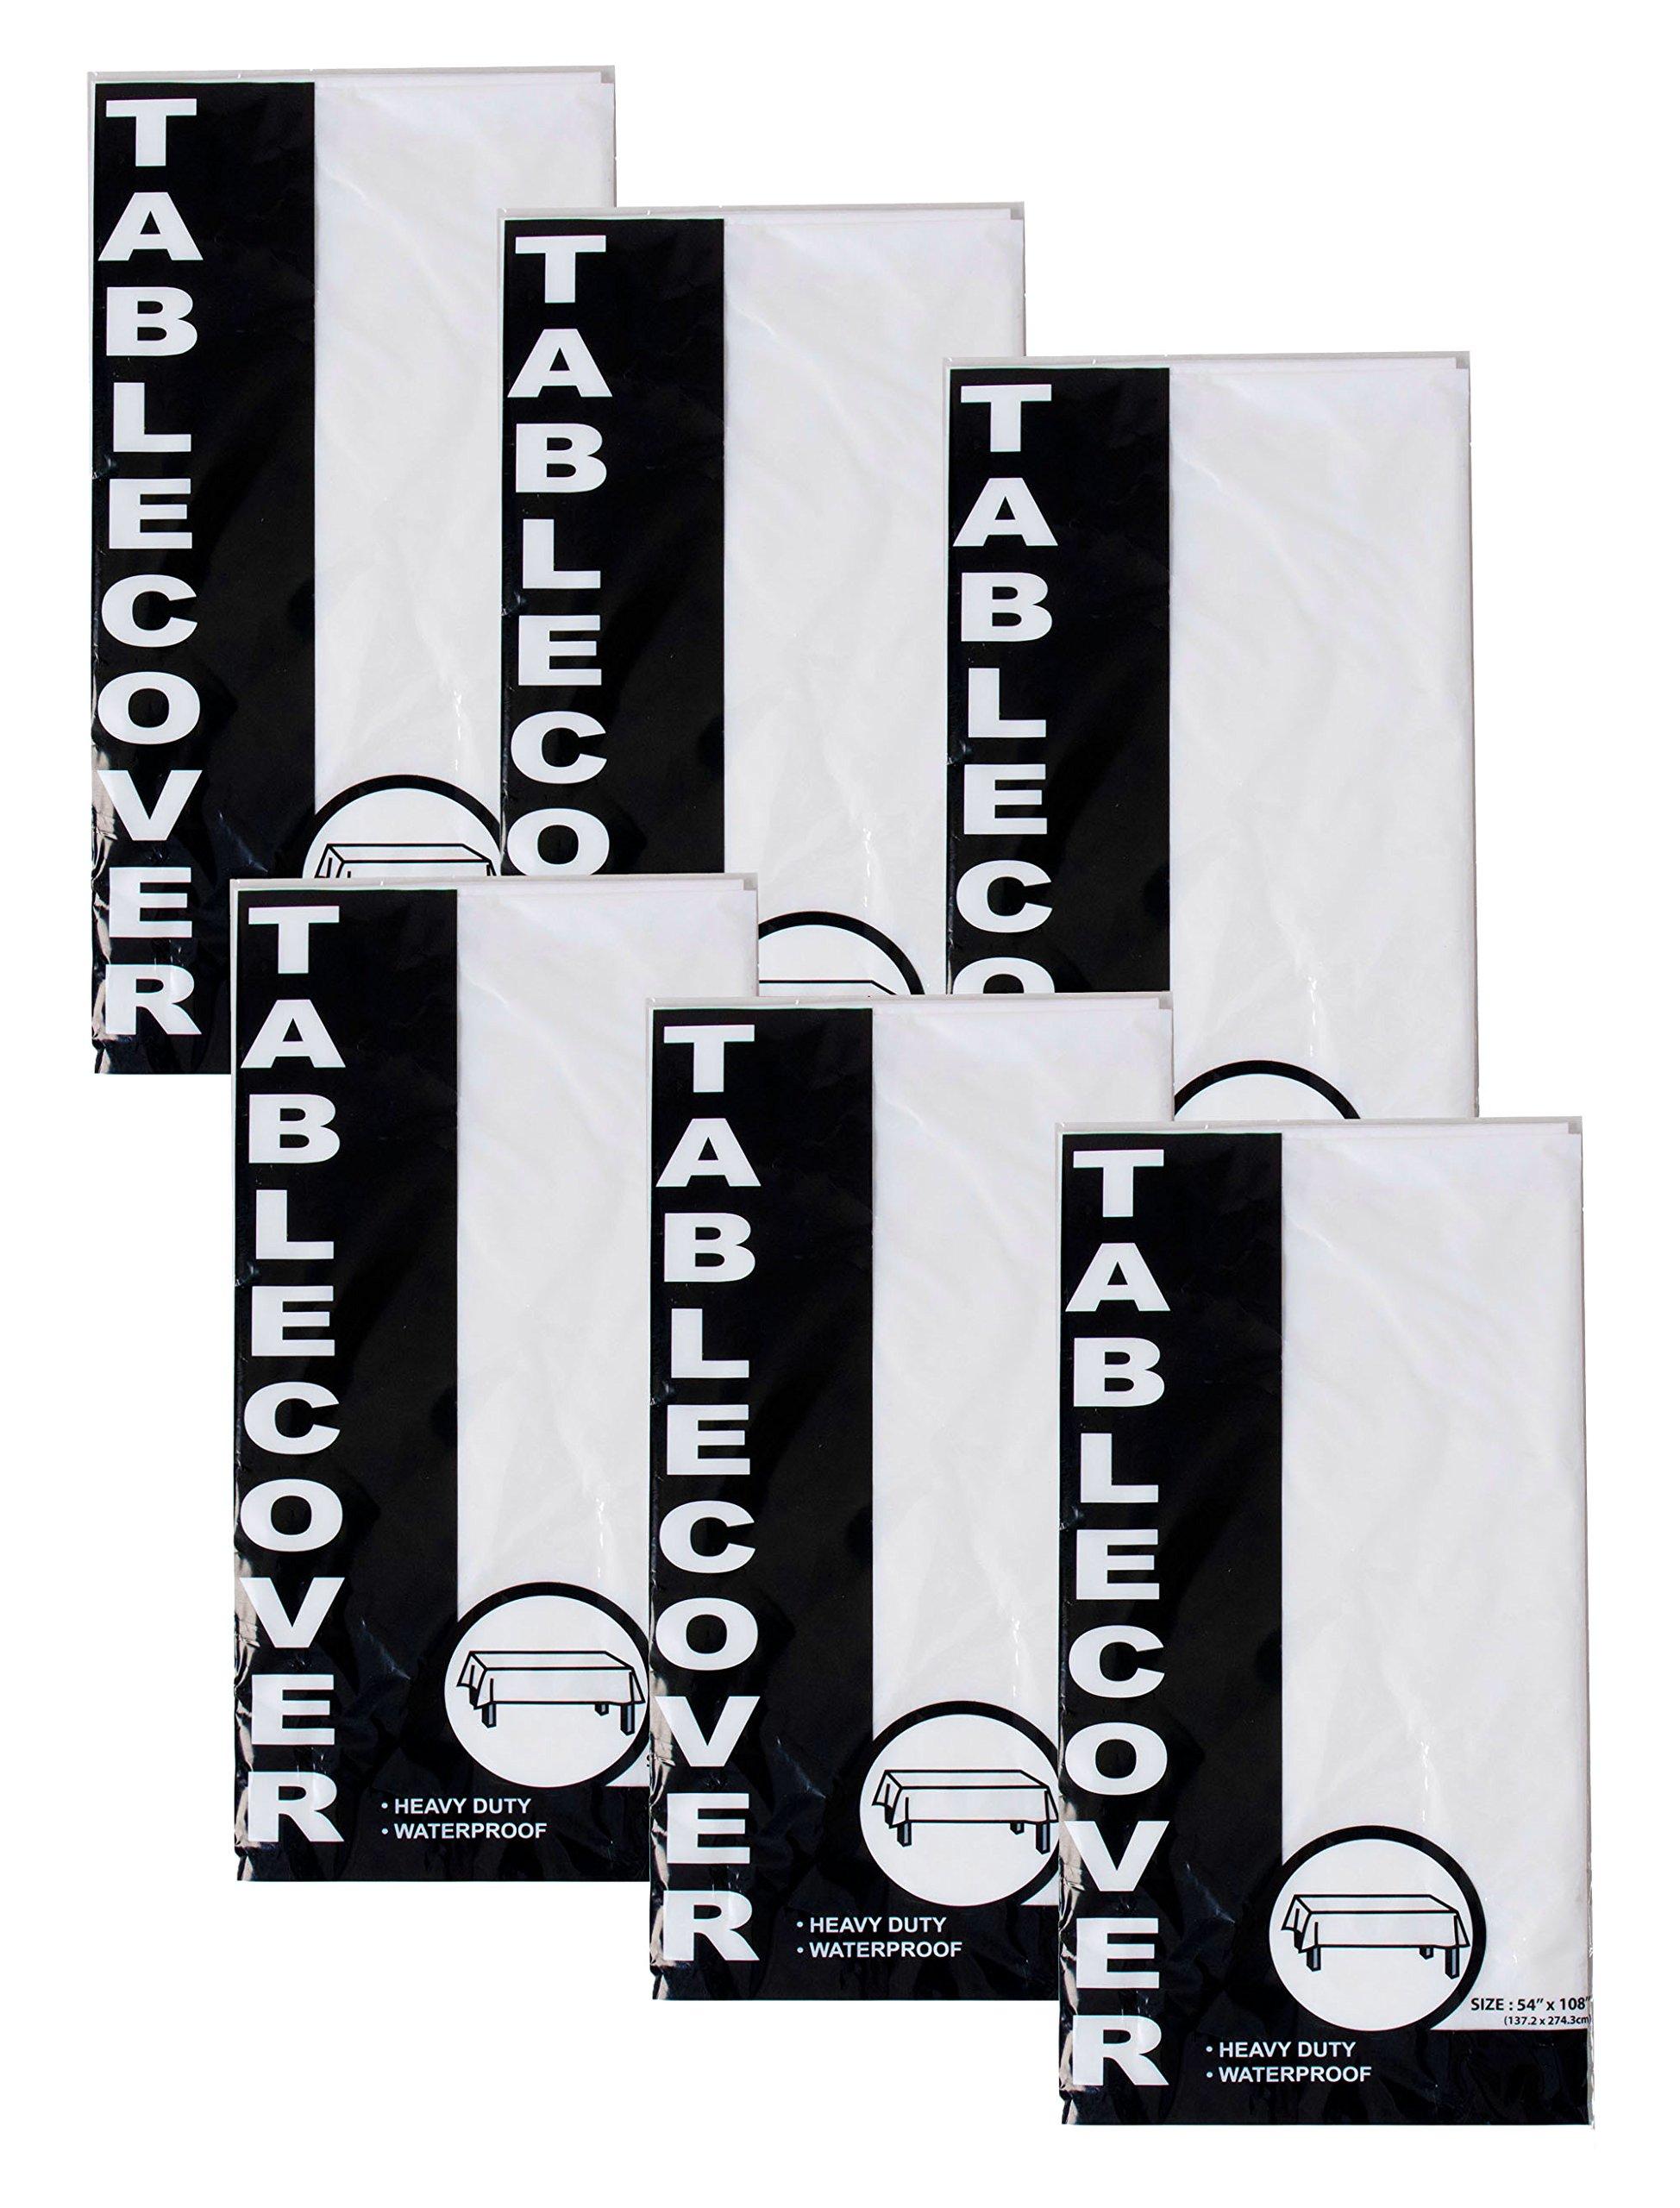 Set of 6 Black Duck Brand 54'' x 108'' Rectangler White Tablecover – Waterproof / Heavy Duty!